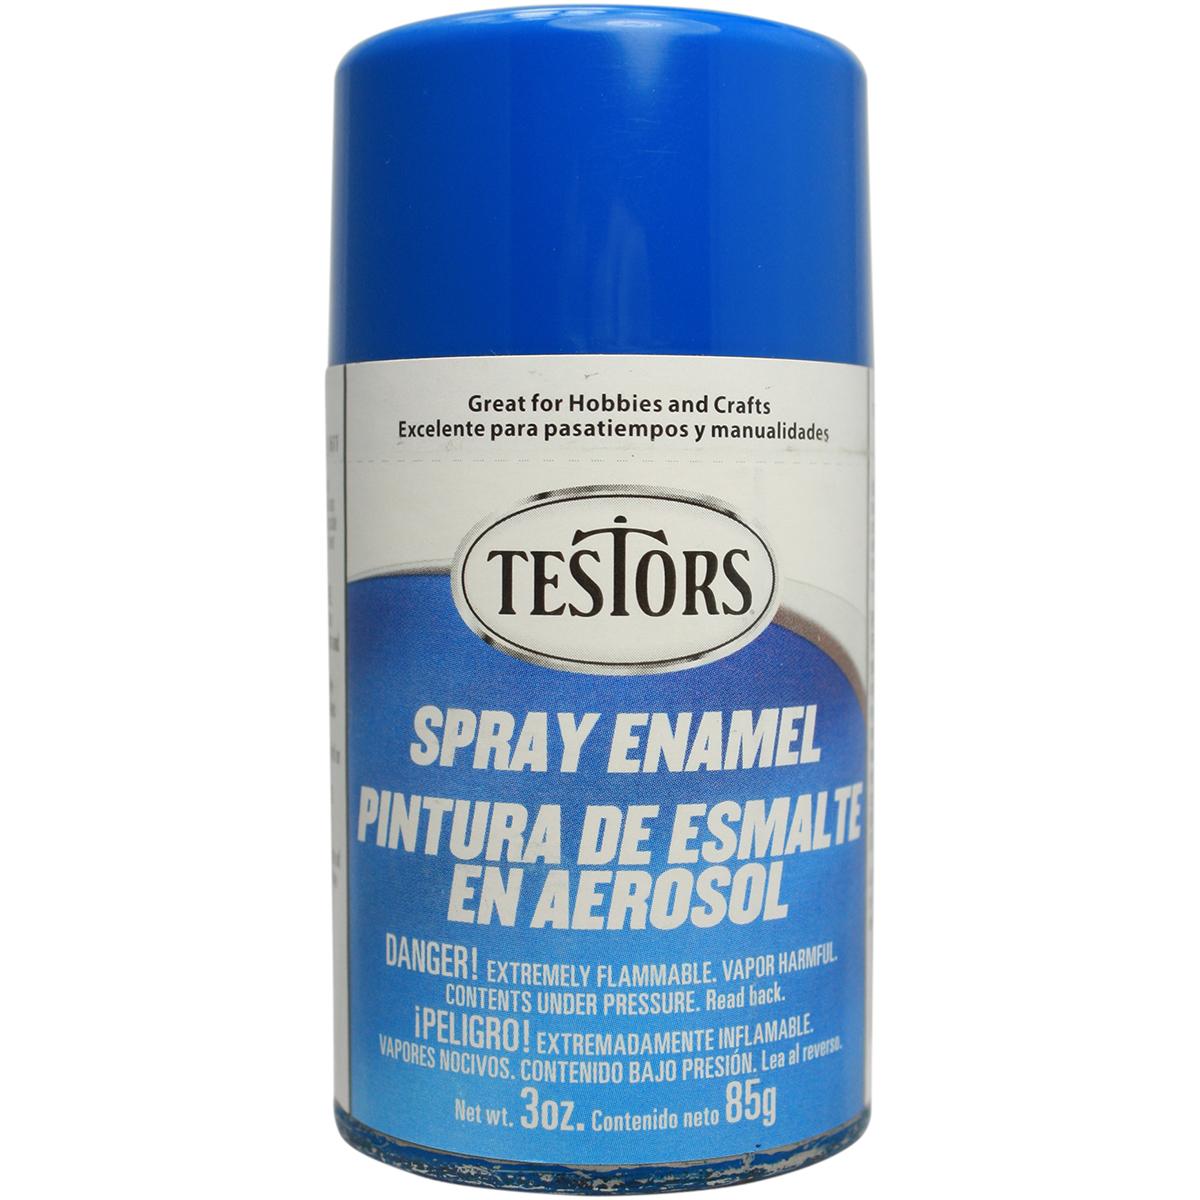 Testors Spray Enamel 3oz - Gloss Bright Blue